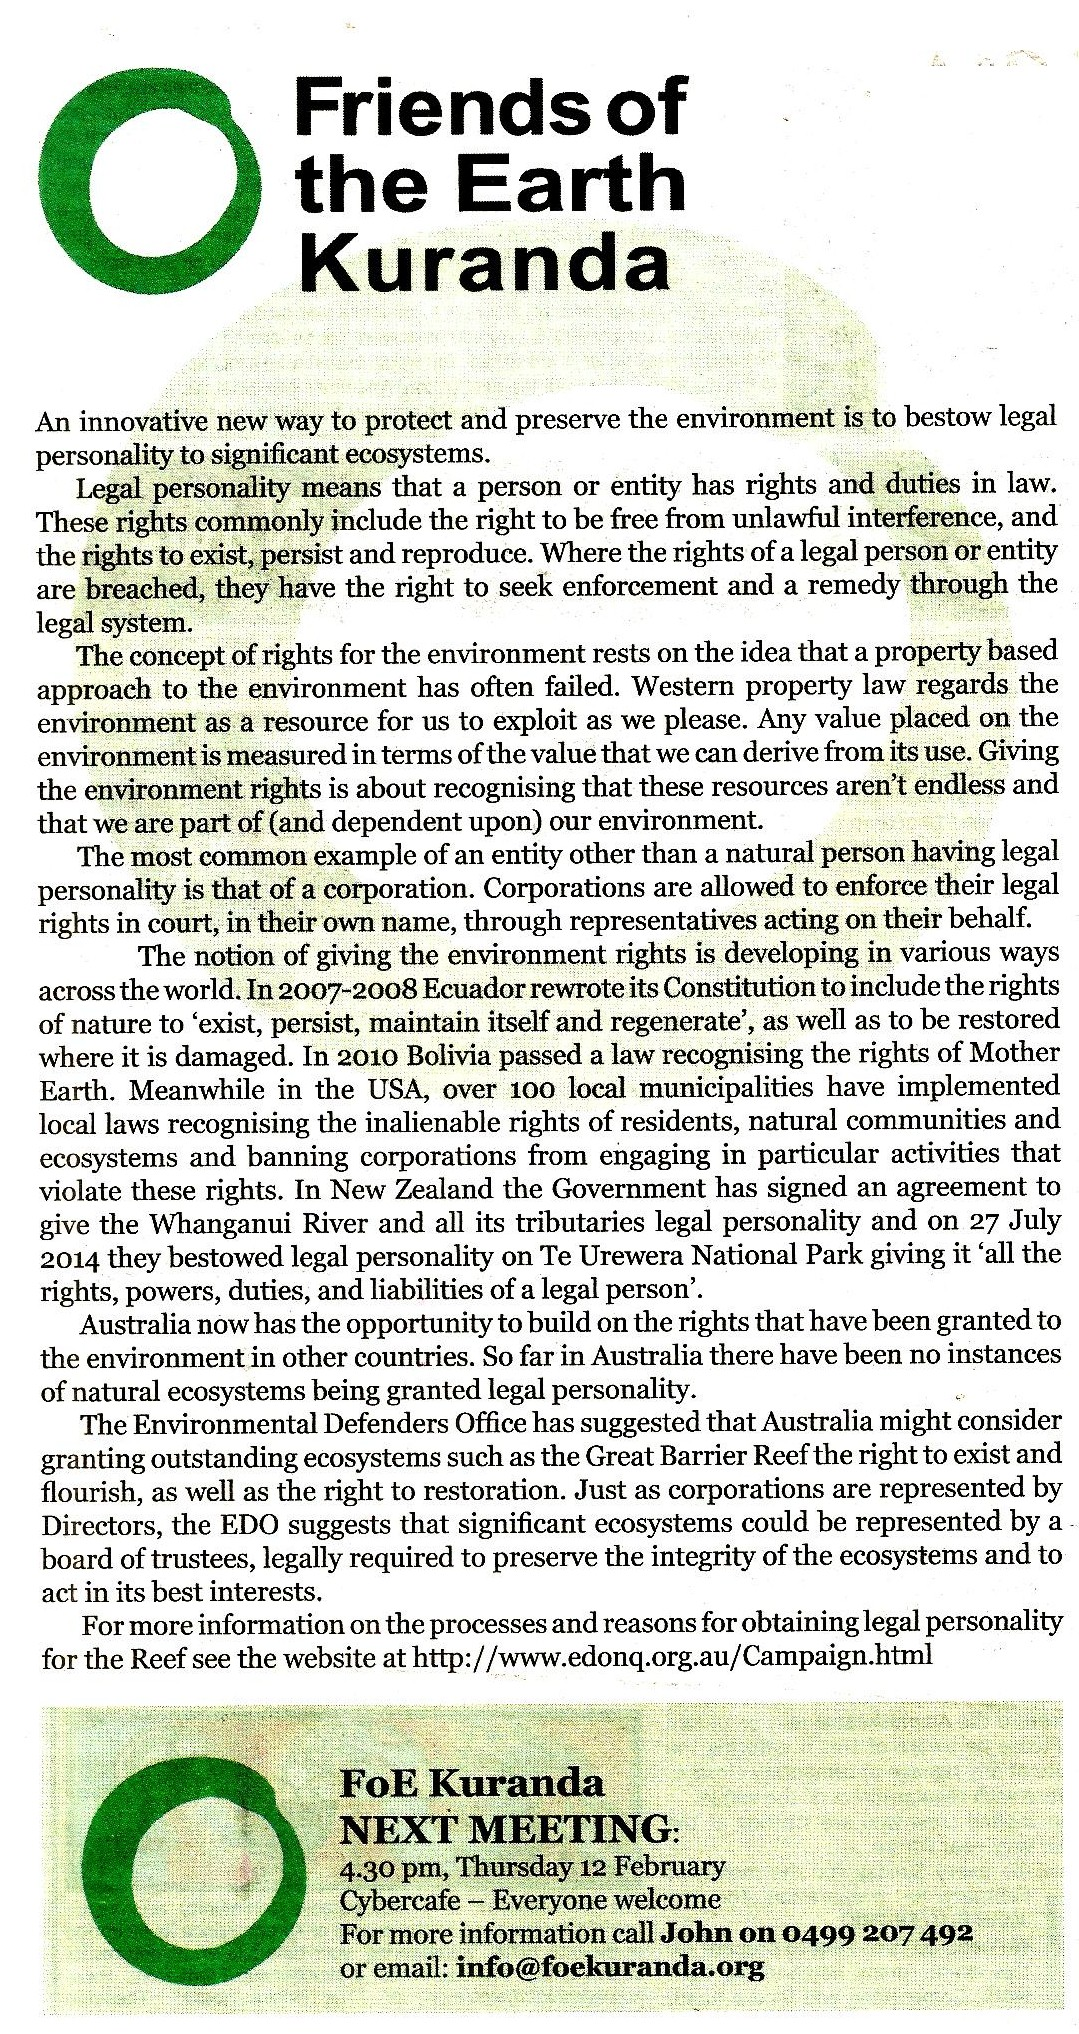 Kuranda-Paper-February-2014-3.jpg